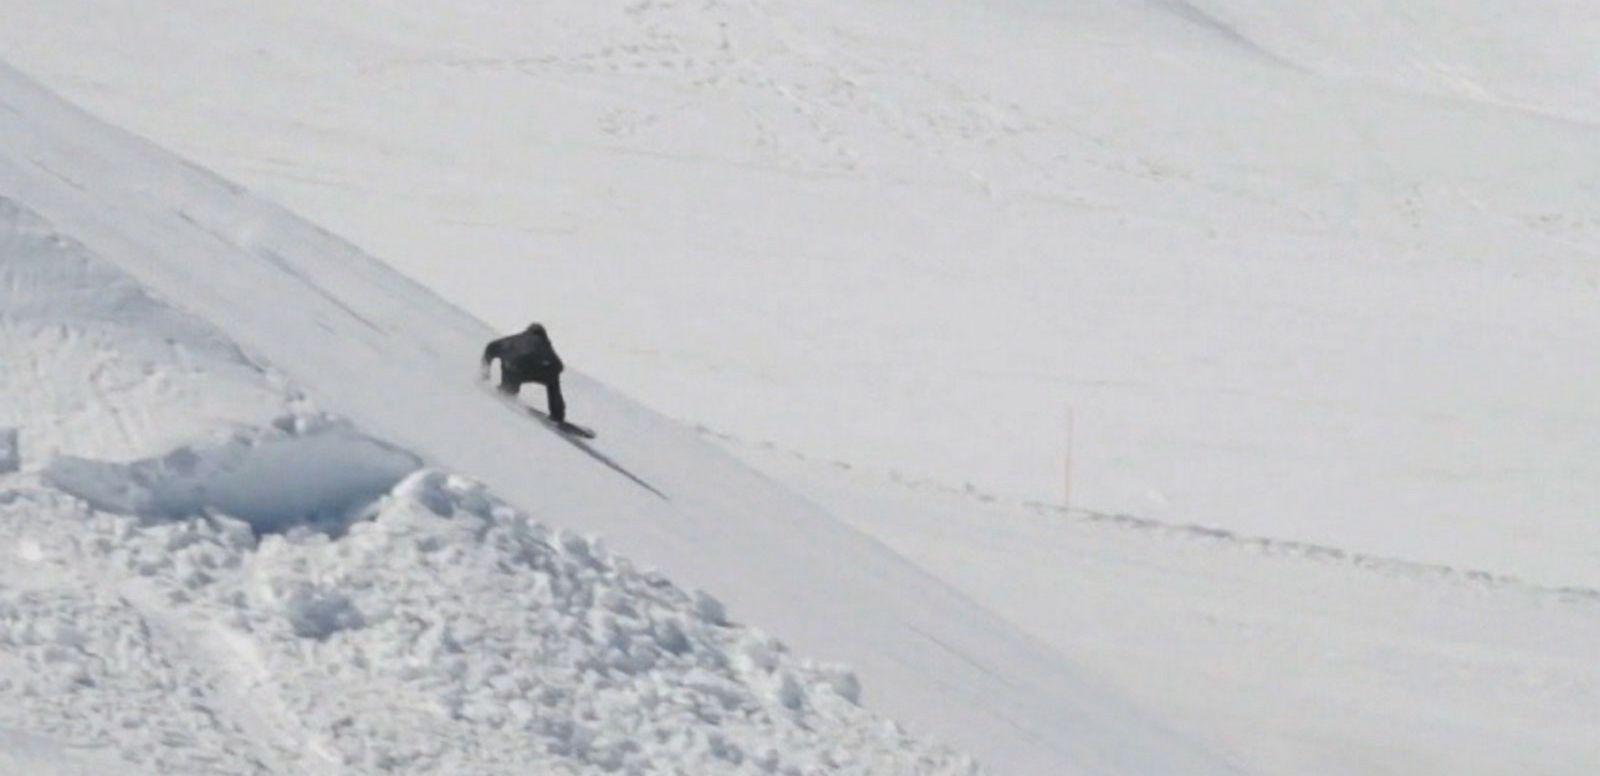 VIDEO: Snowboarding Daredevil Performs Record Breaking Trick